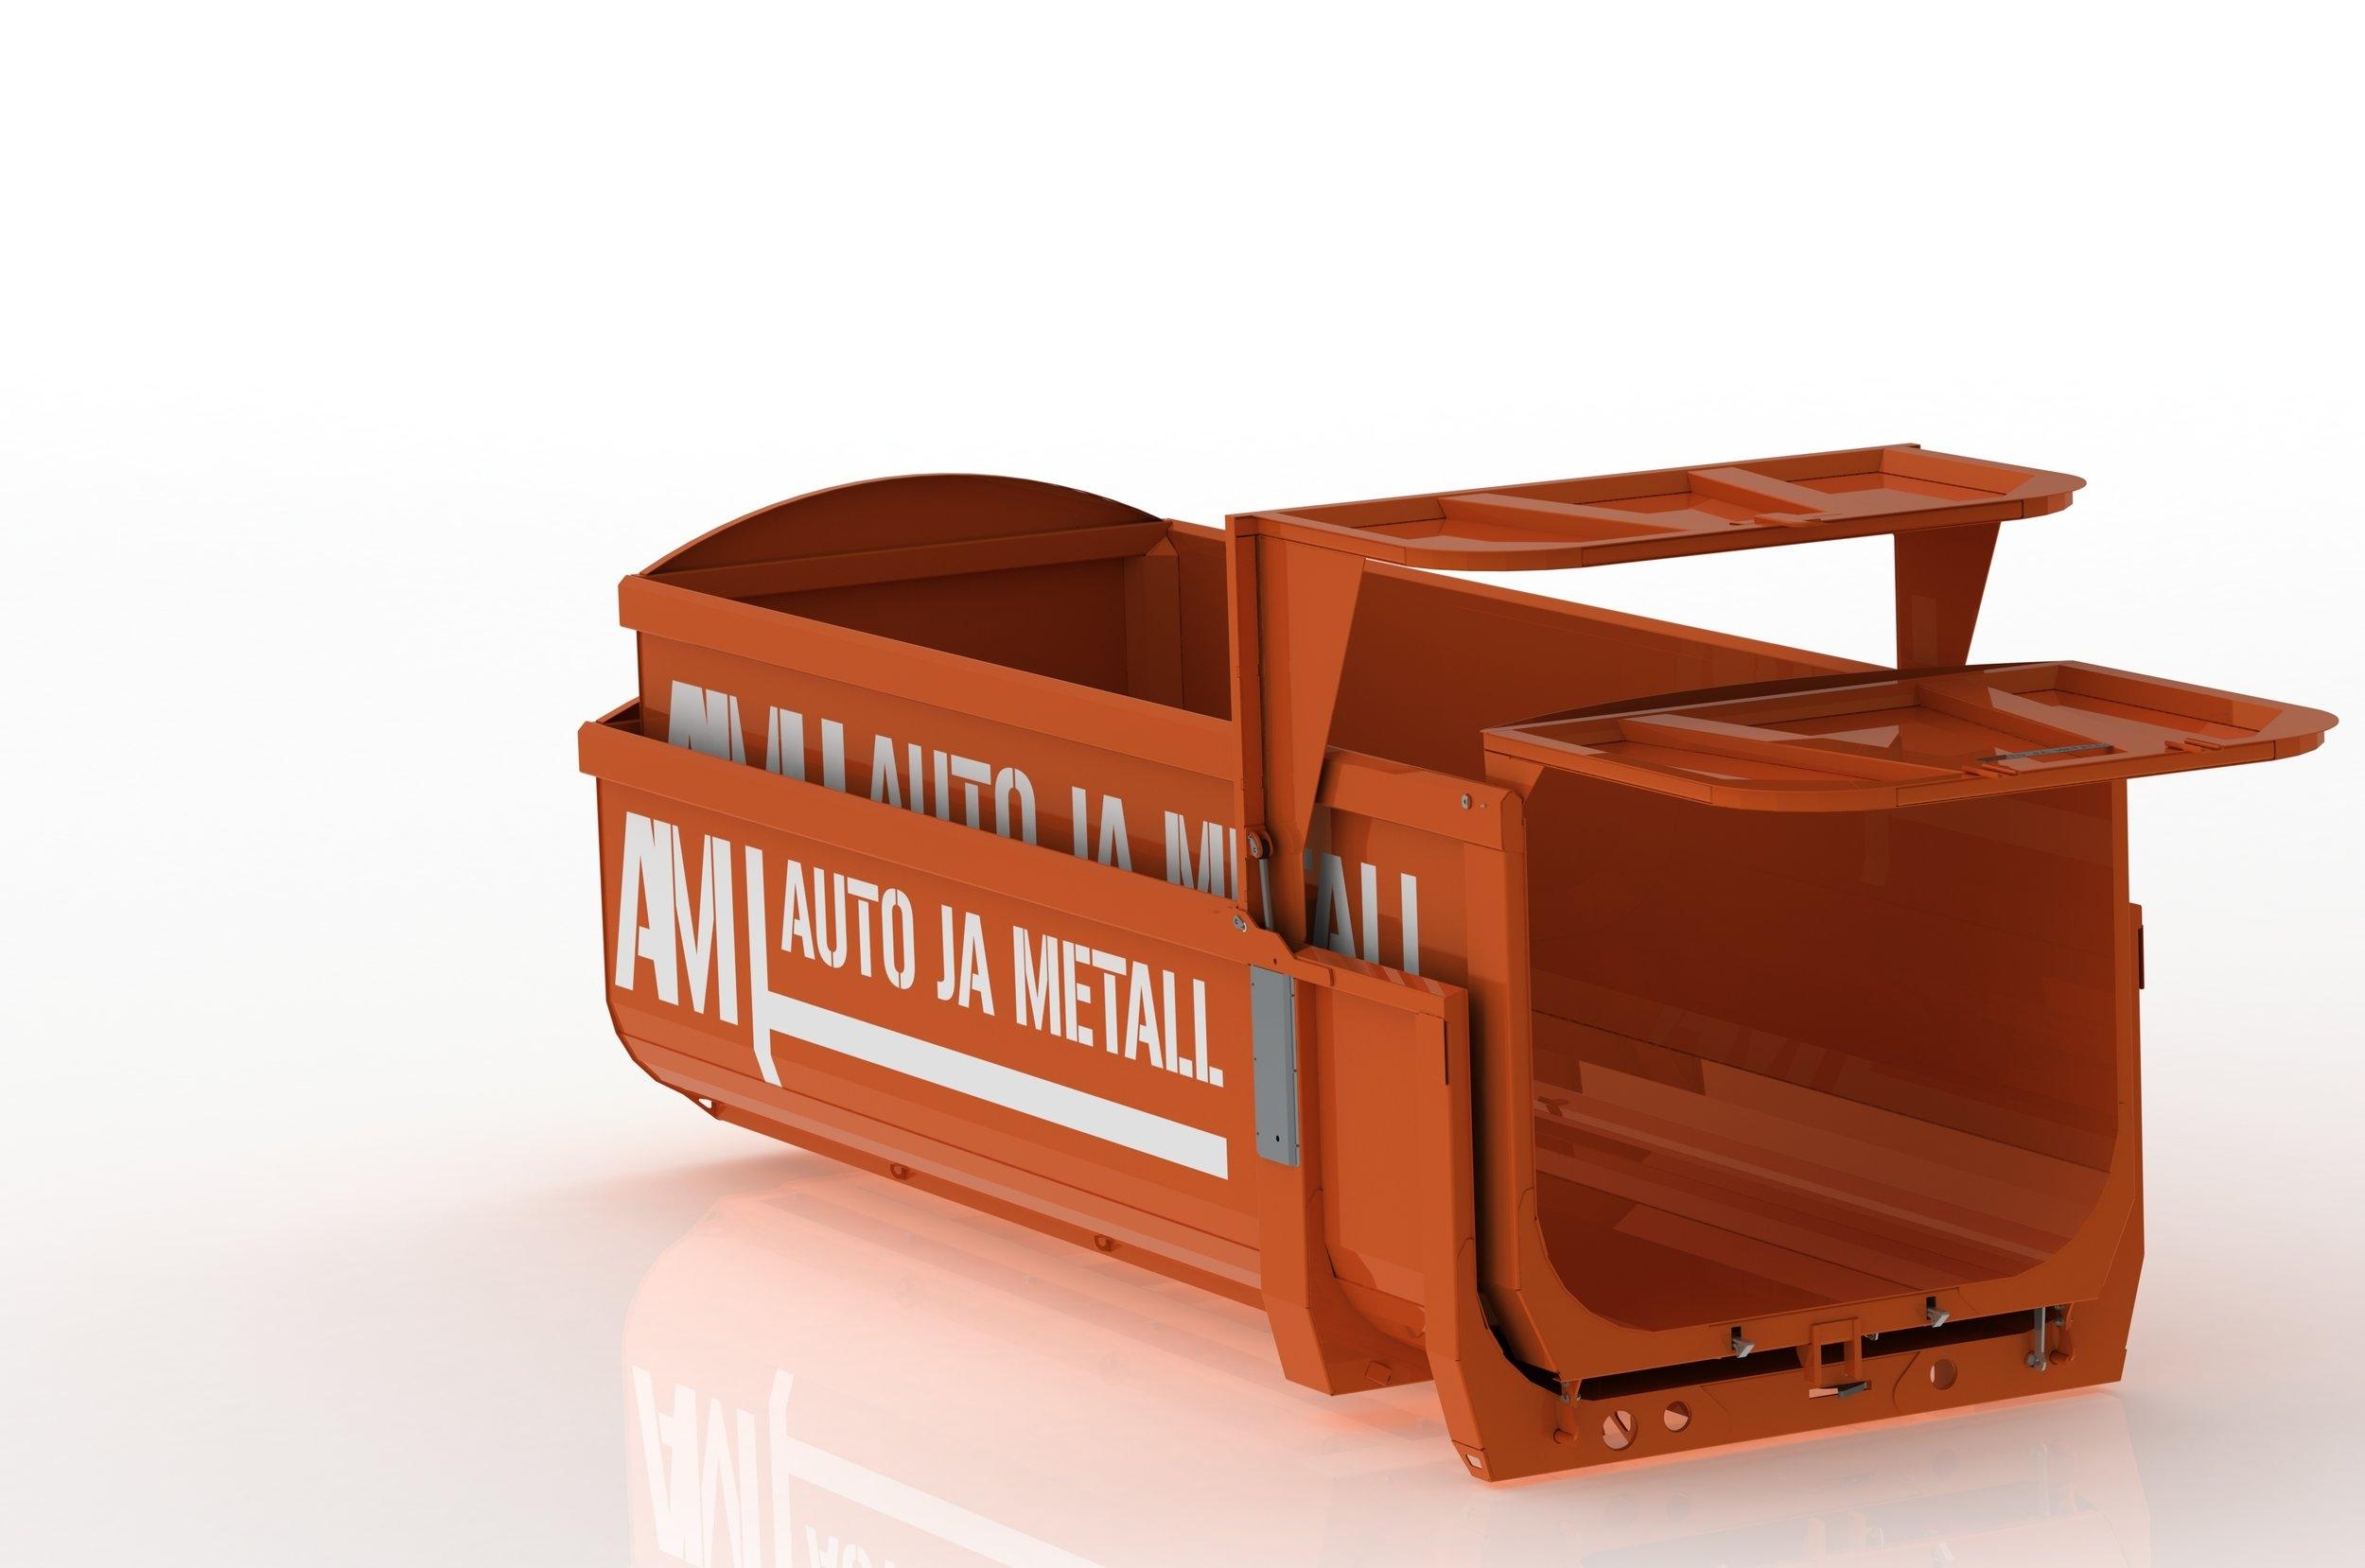 Auto Ja Metall OÜ